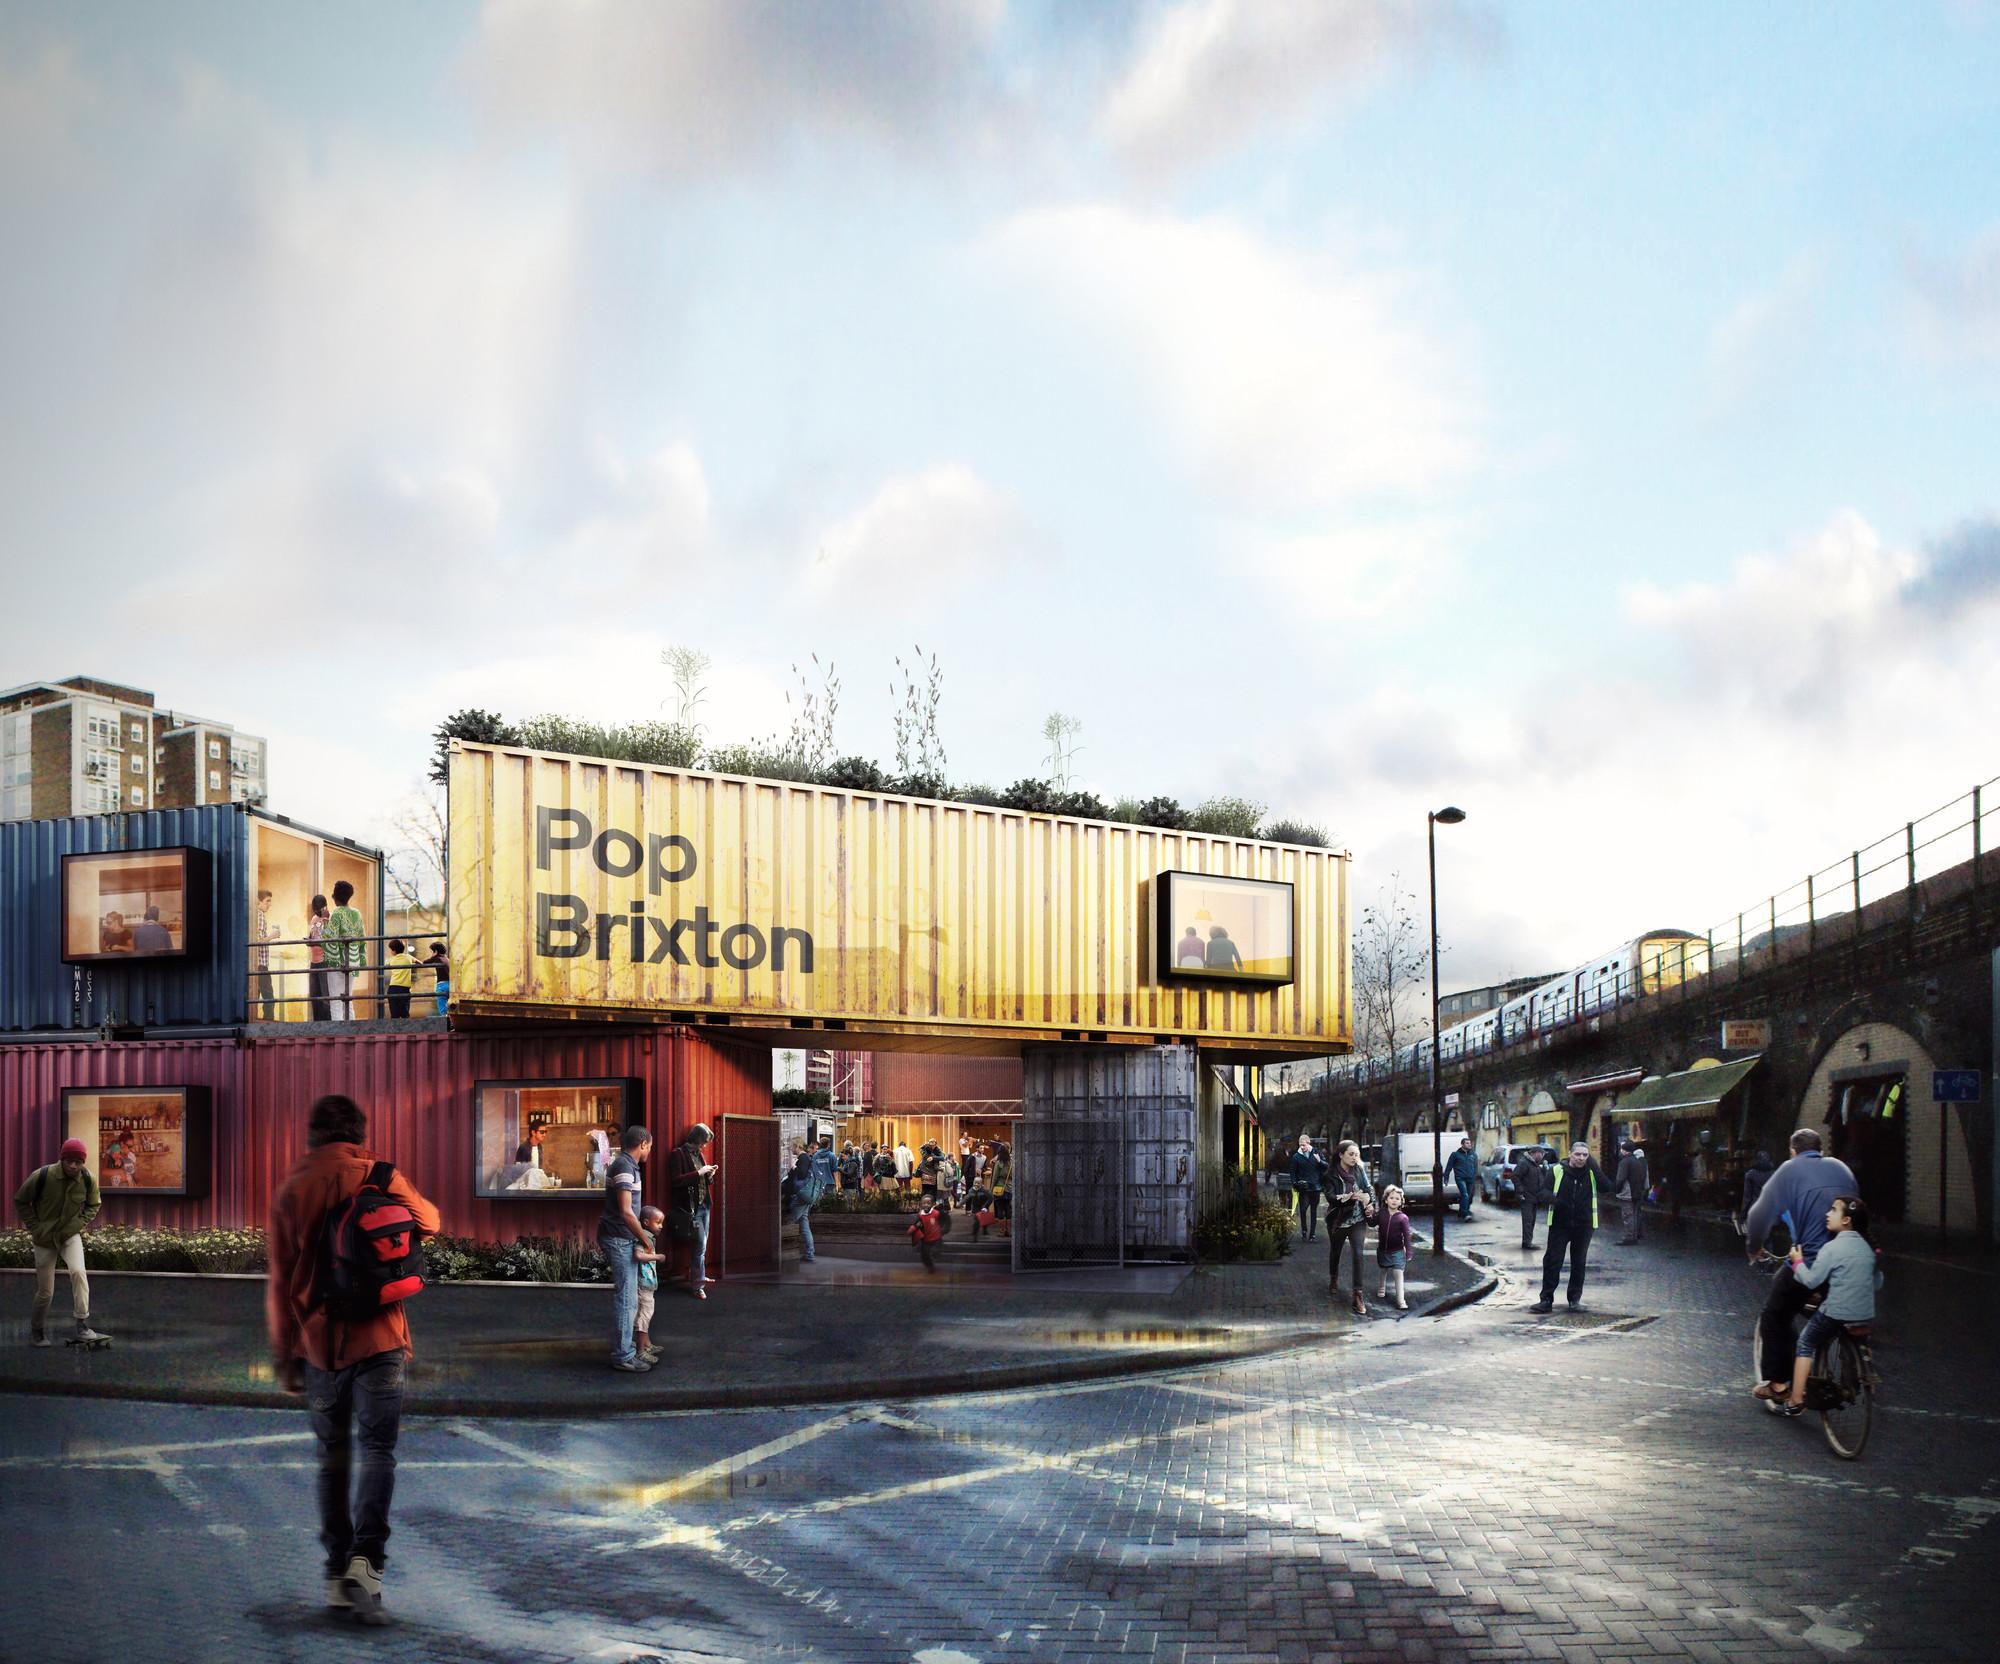 RIBA London Announces 'Work In Progress' Themed Line-Up For LFA 2015, Pop Brixton (entrance). Image Courtesy of RIBA London